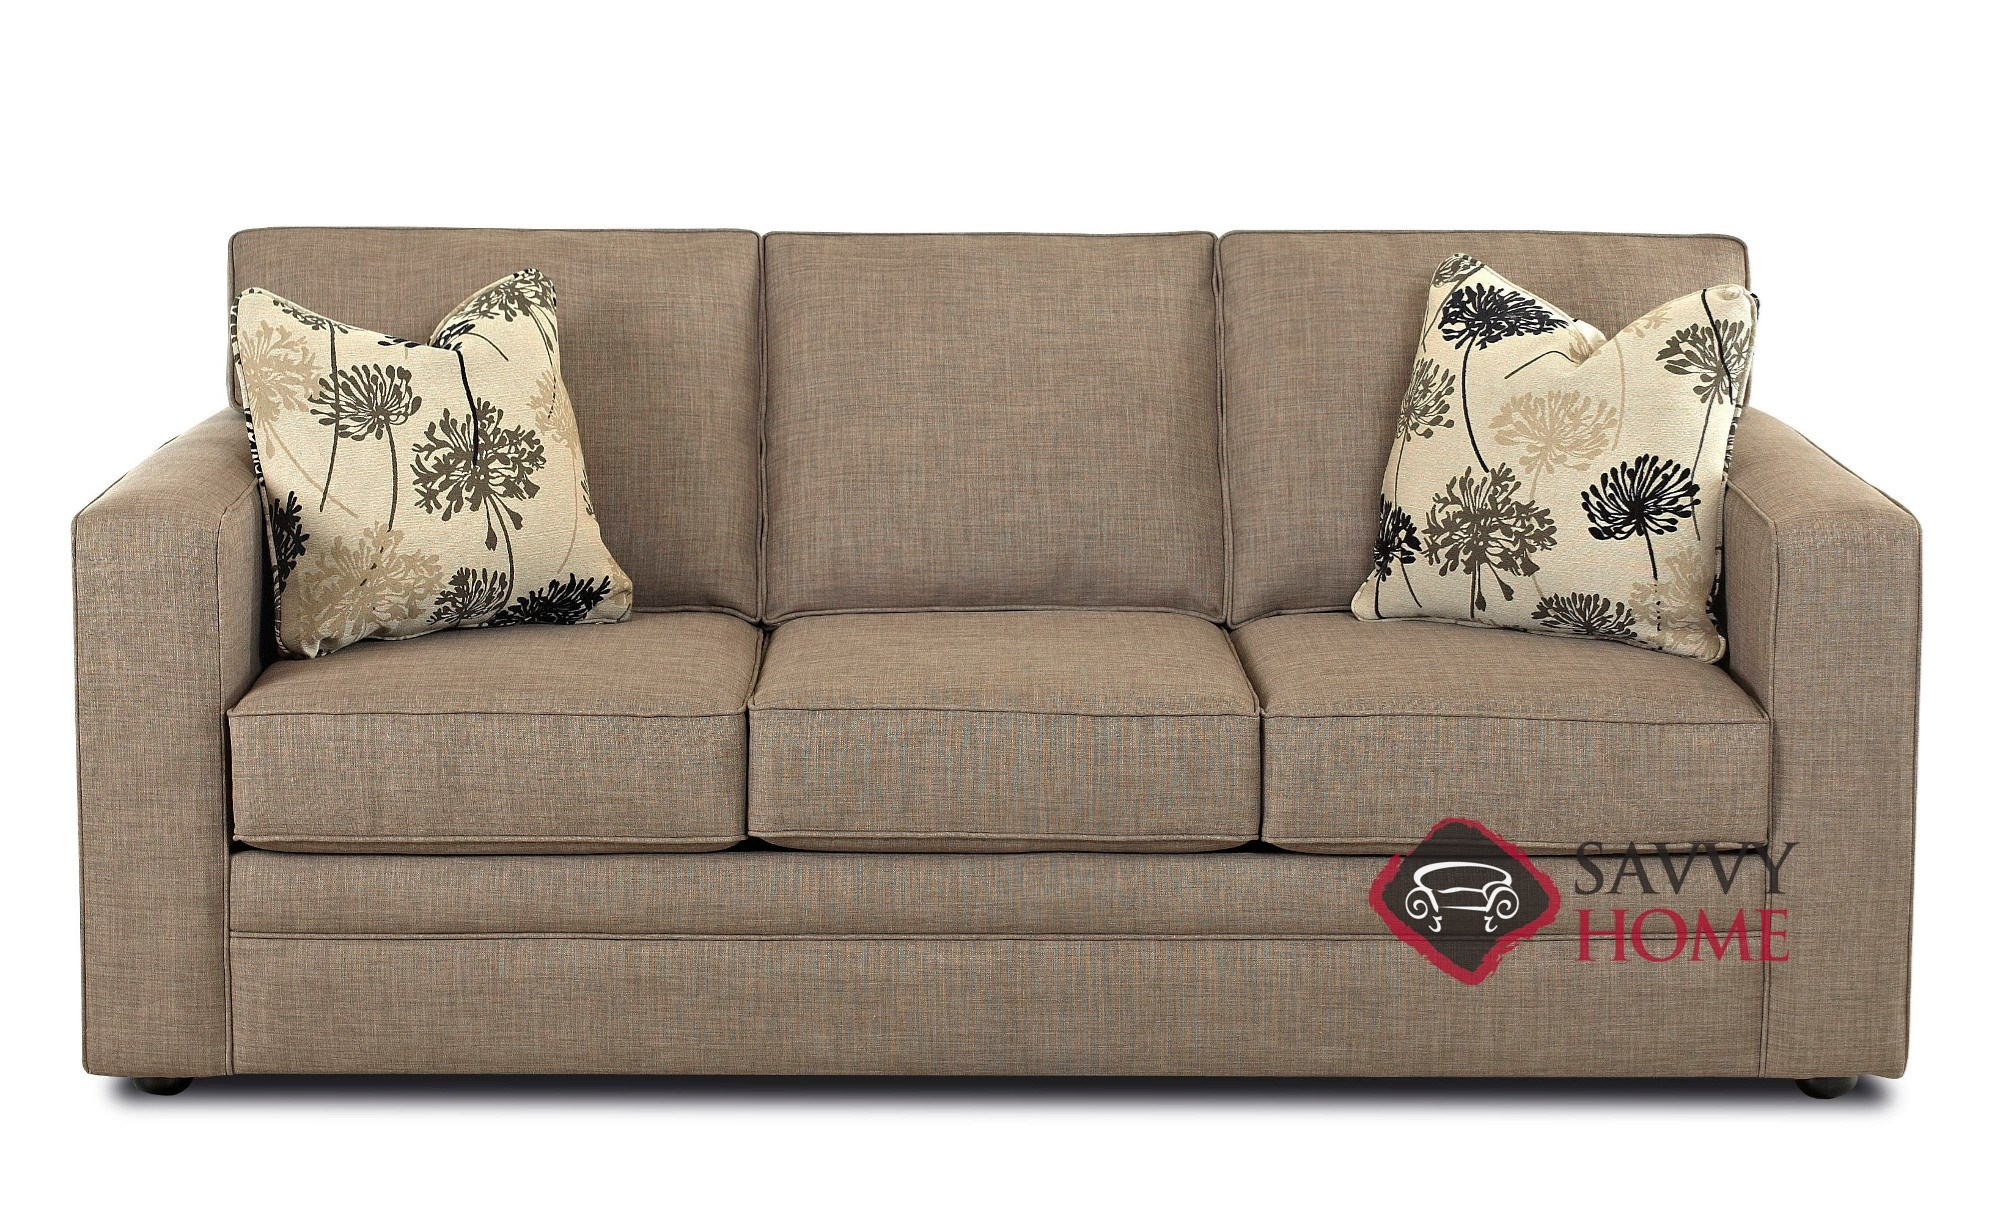 Boston Sofa By Savvy